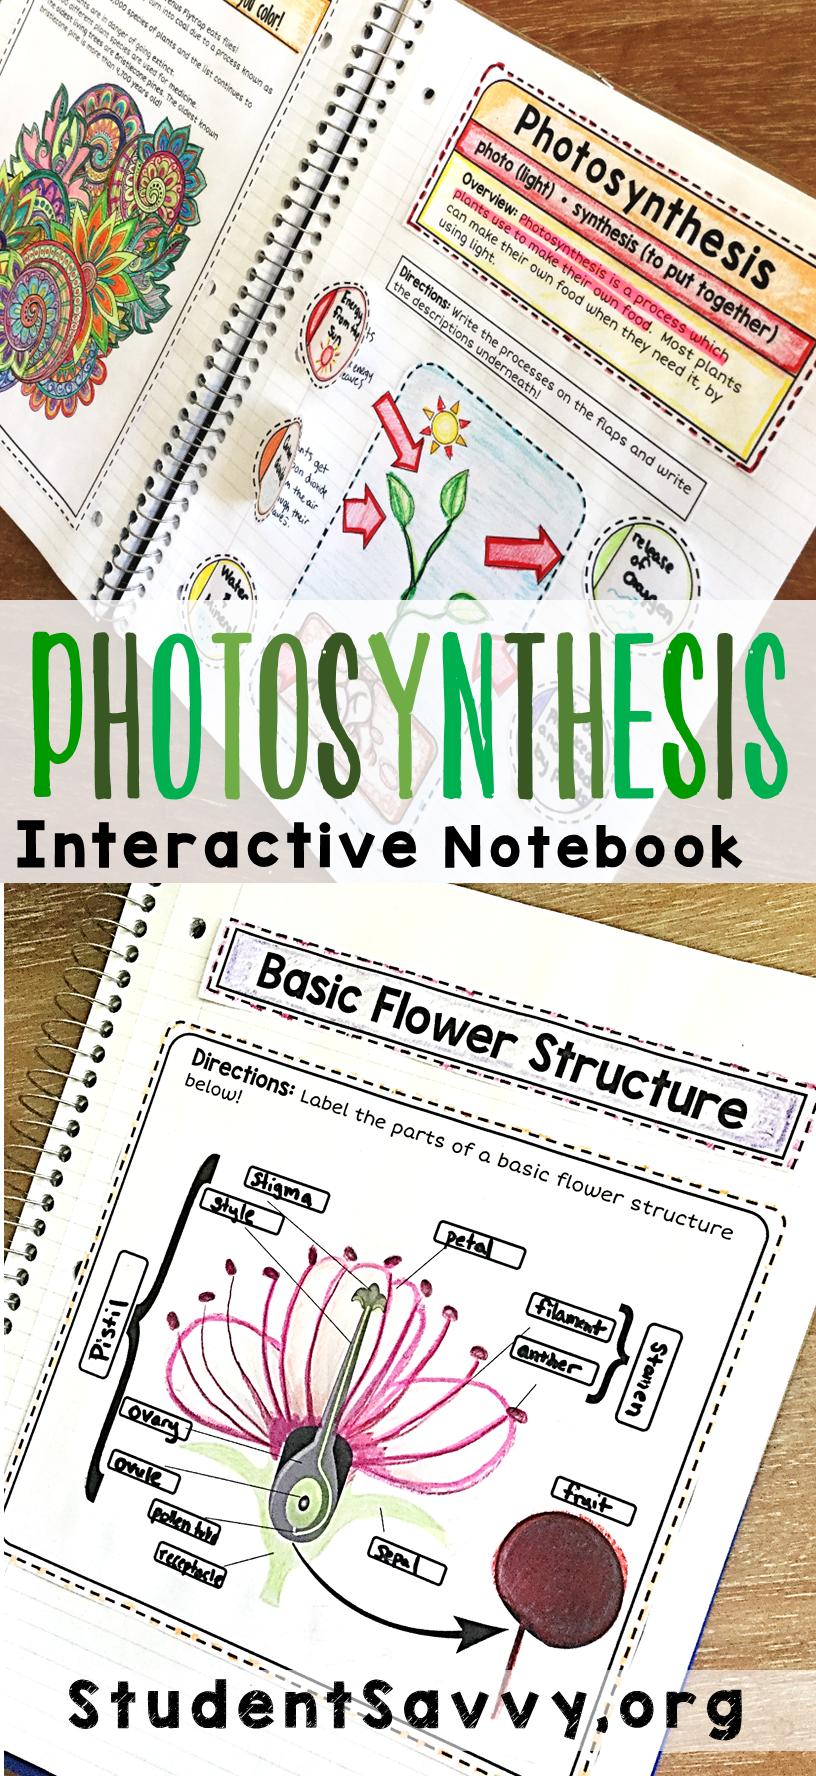 Photosynthesis Interactive Notebook Уроки биологии